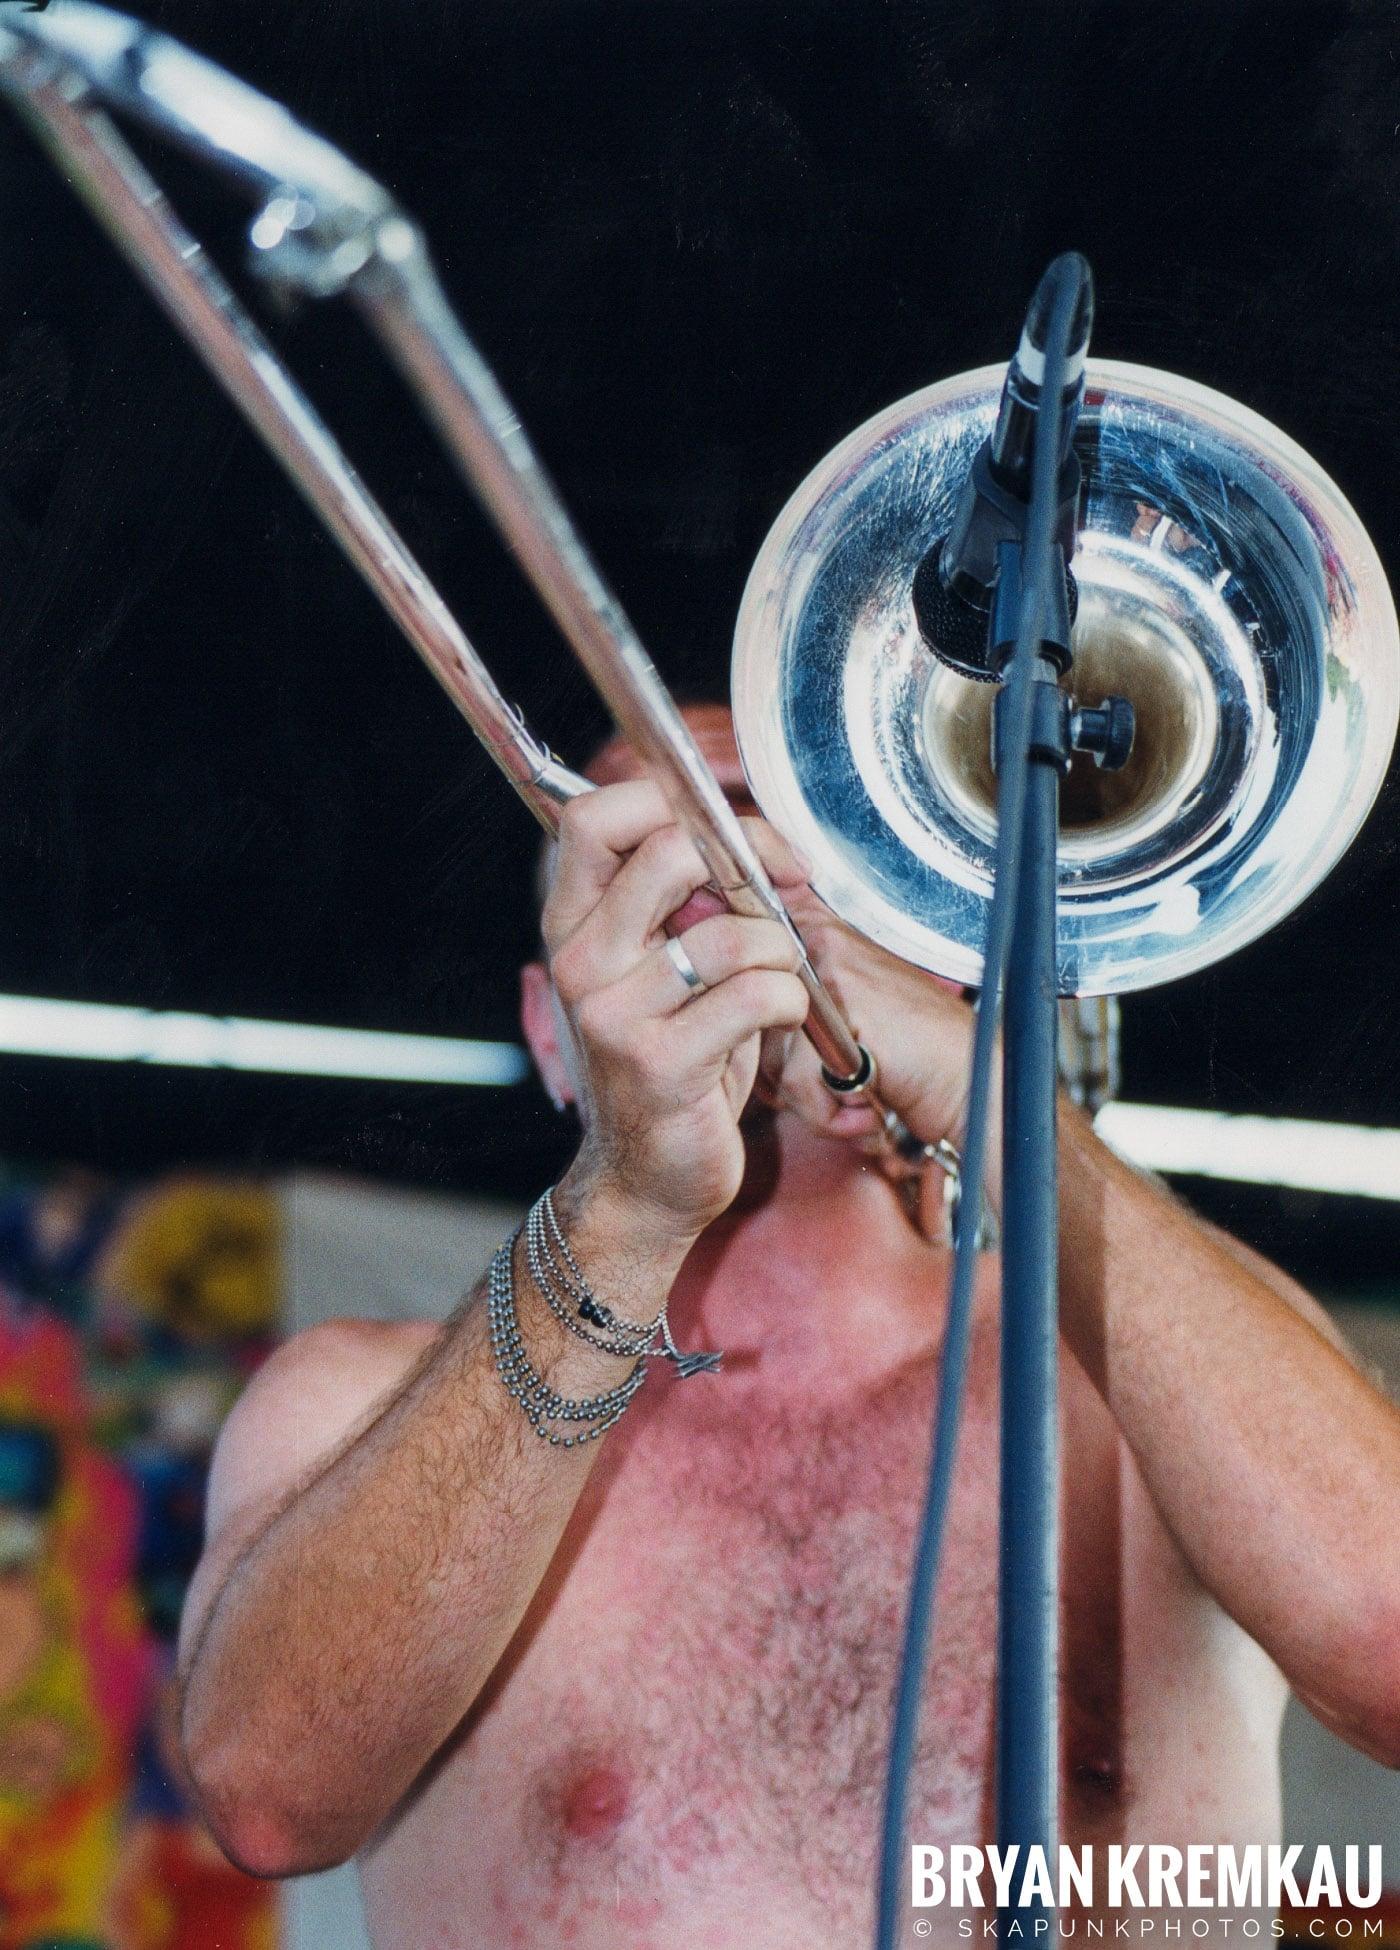 Less Than Jake @ Vans Warped Tour, Randall's Island, NYC - 7.16.99 (2)